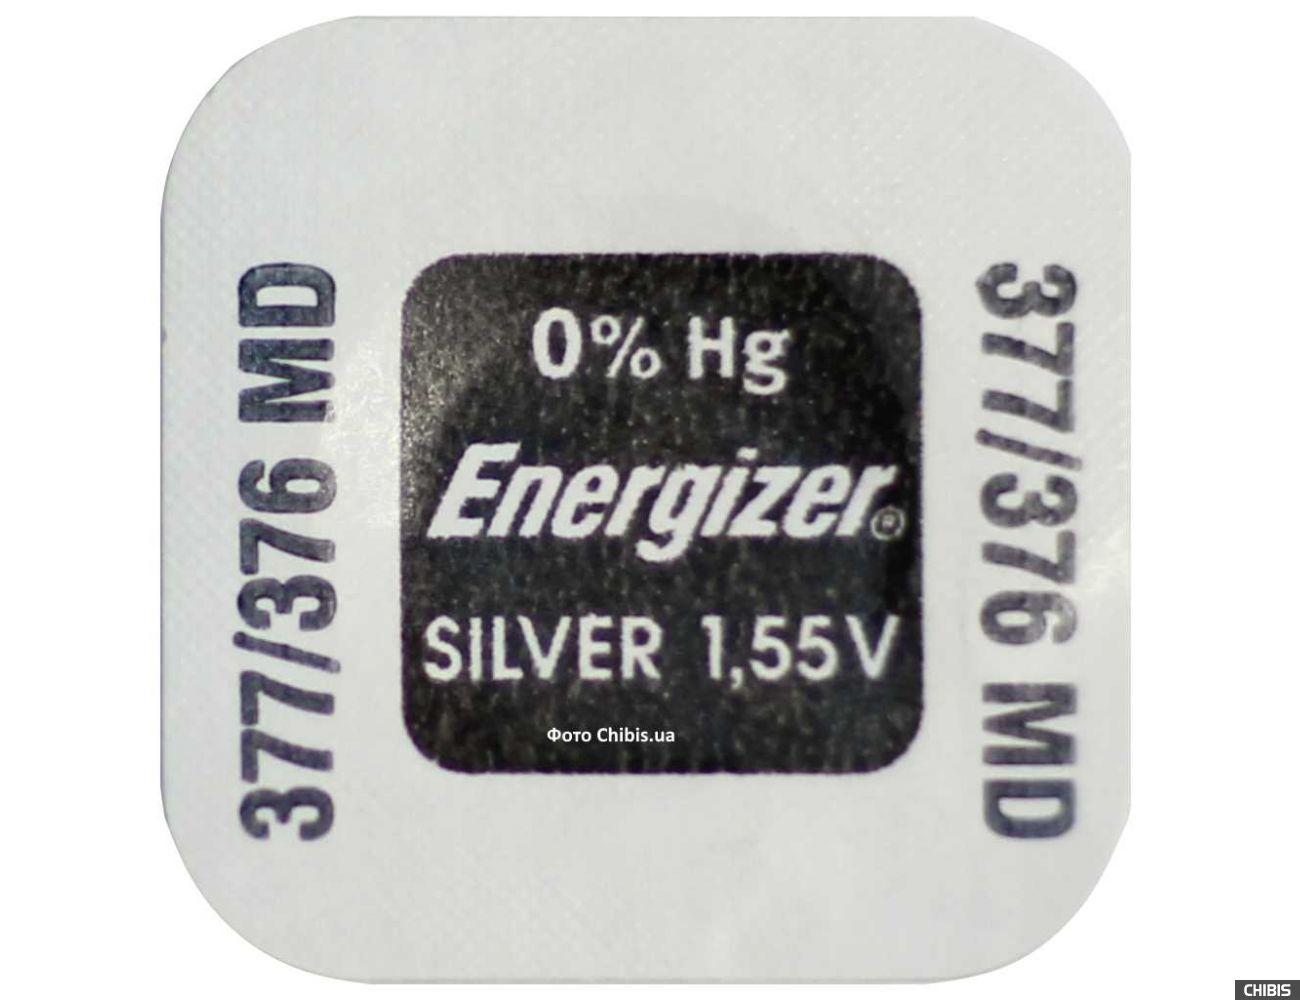 Батарейка 377-376 Energizer 1.55V Silver Oxide